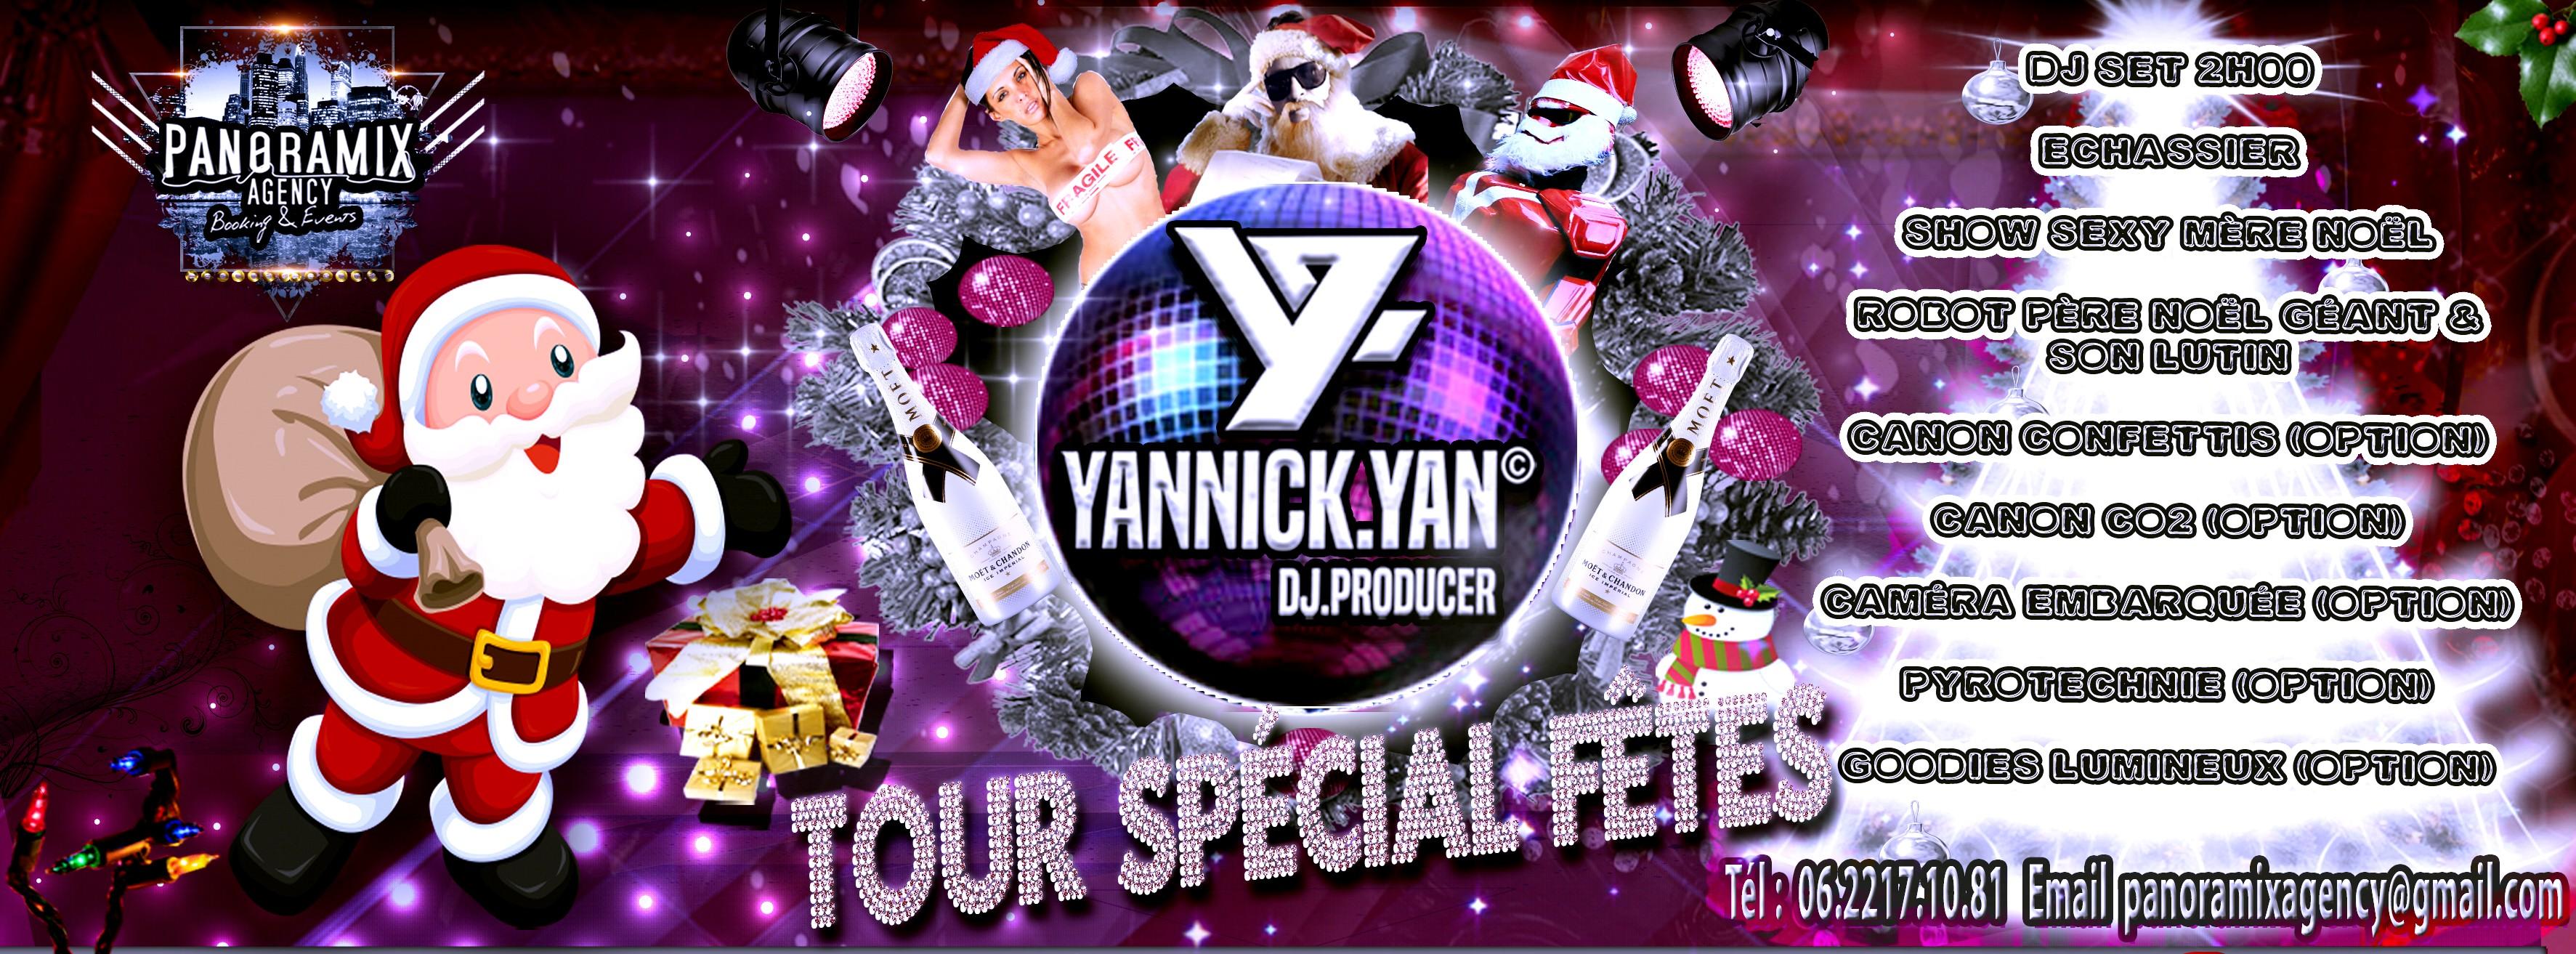 http://panoramix-radio-station.com/wp-content/uploads/2017/10/NOEL-TOUR-BANNER-yan-fb.jpg